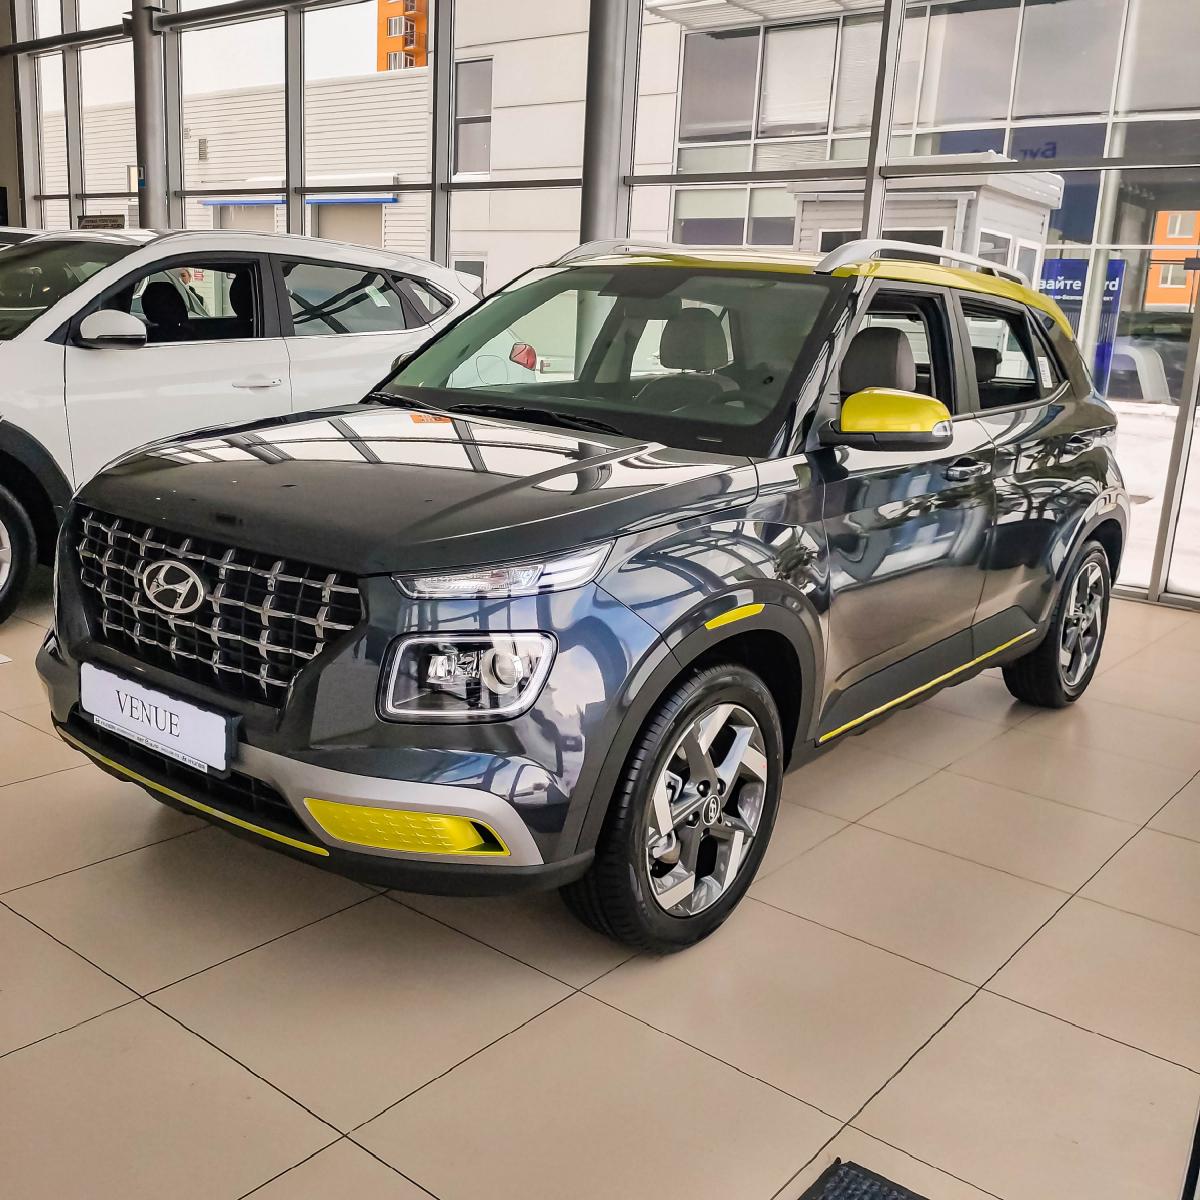 Абсолютно новий компактний міський кросовер Hyundai Venue   Хюндай Мотор Україна - фото 17